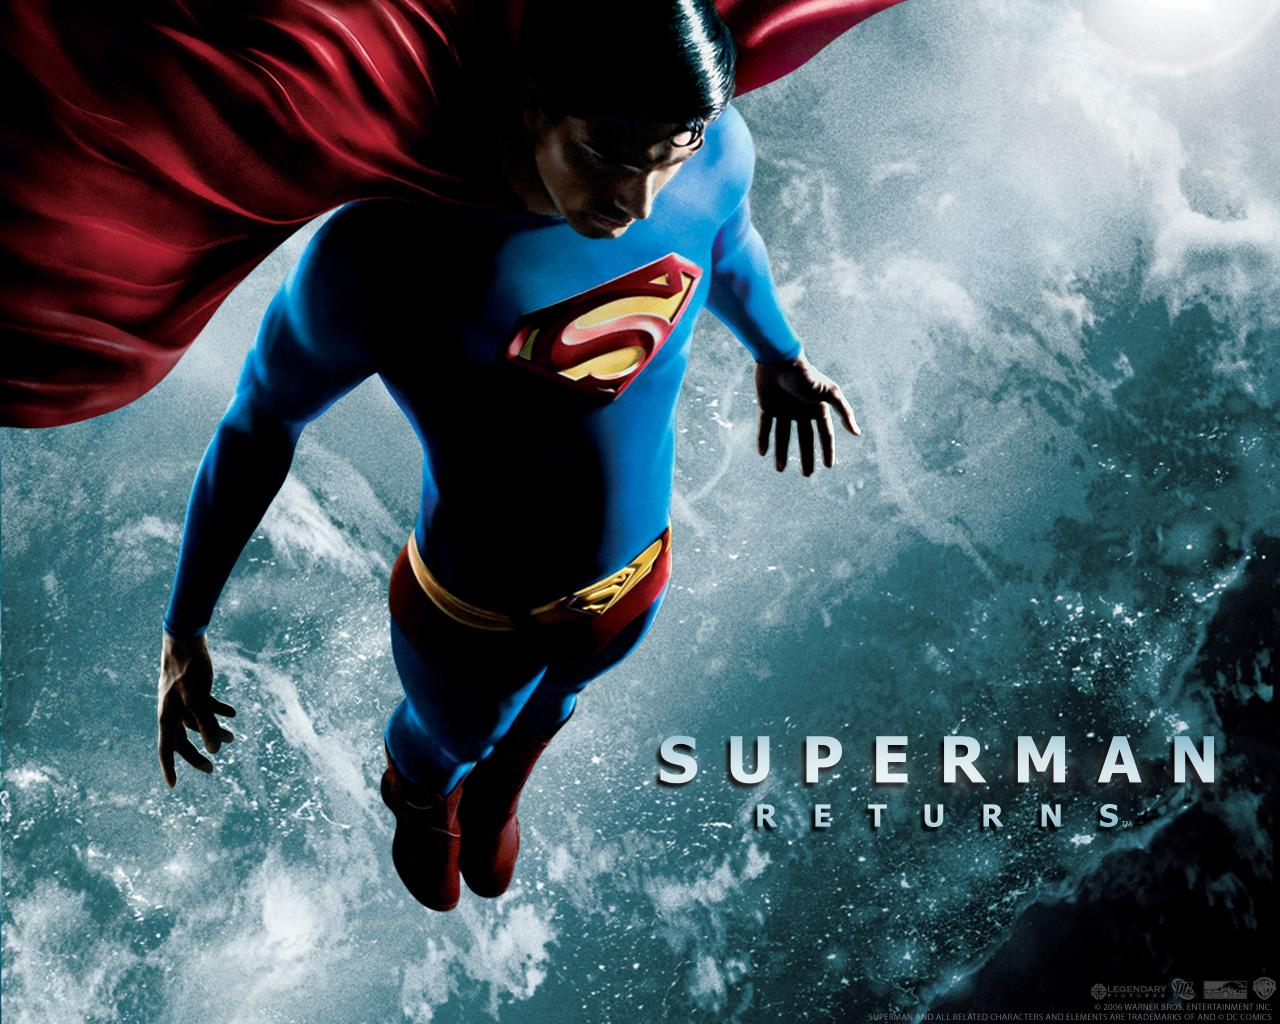 Cool Superman Wallpaper Cartoon Wallpapers 1280x1024